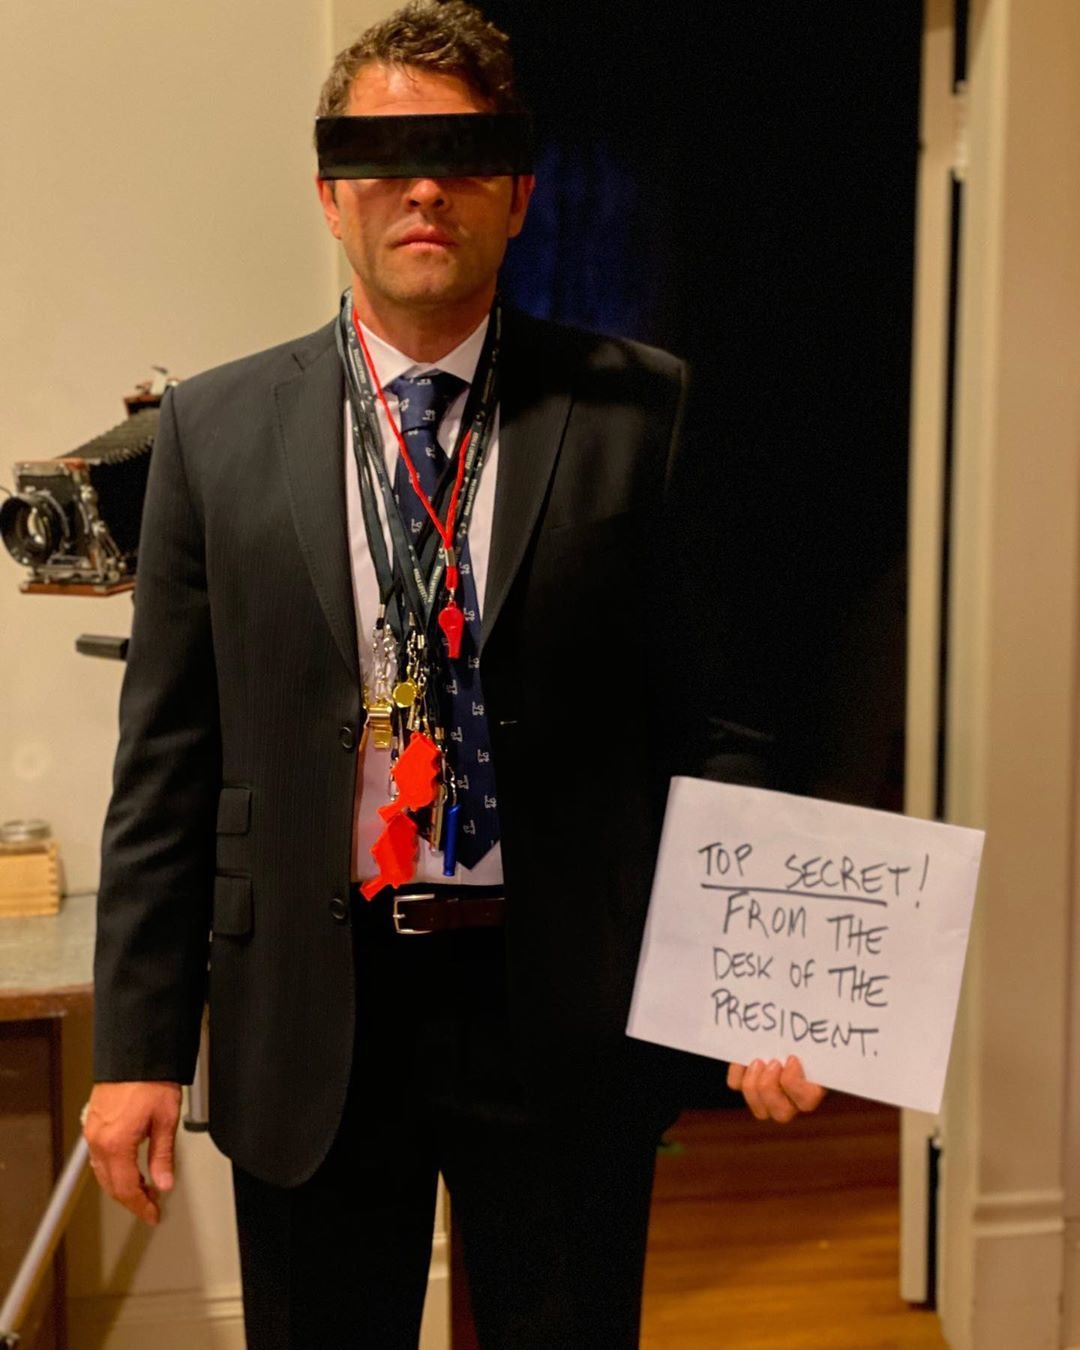 Misha Collins del chivato de Donald Trump